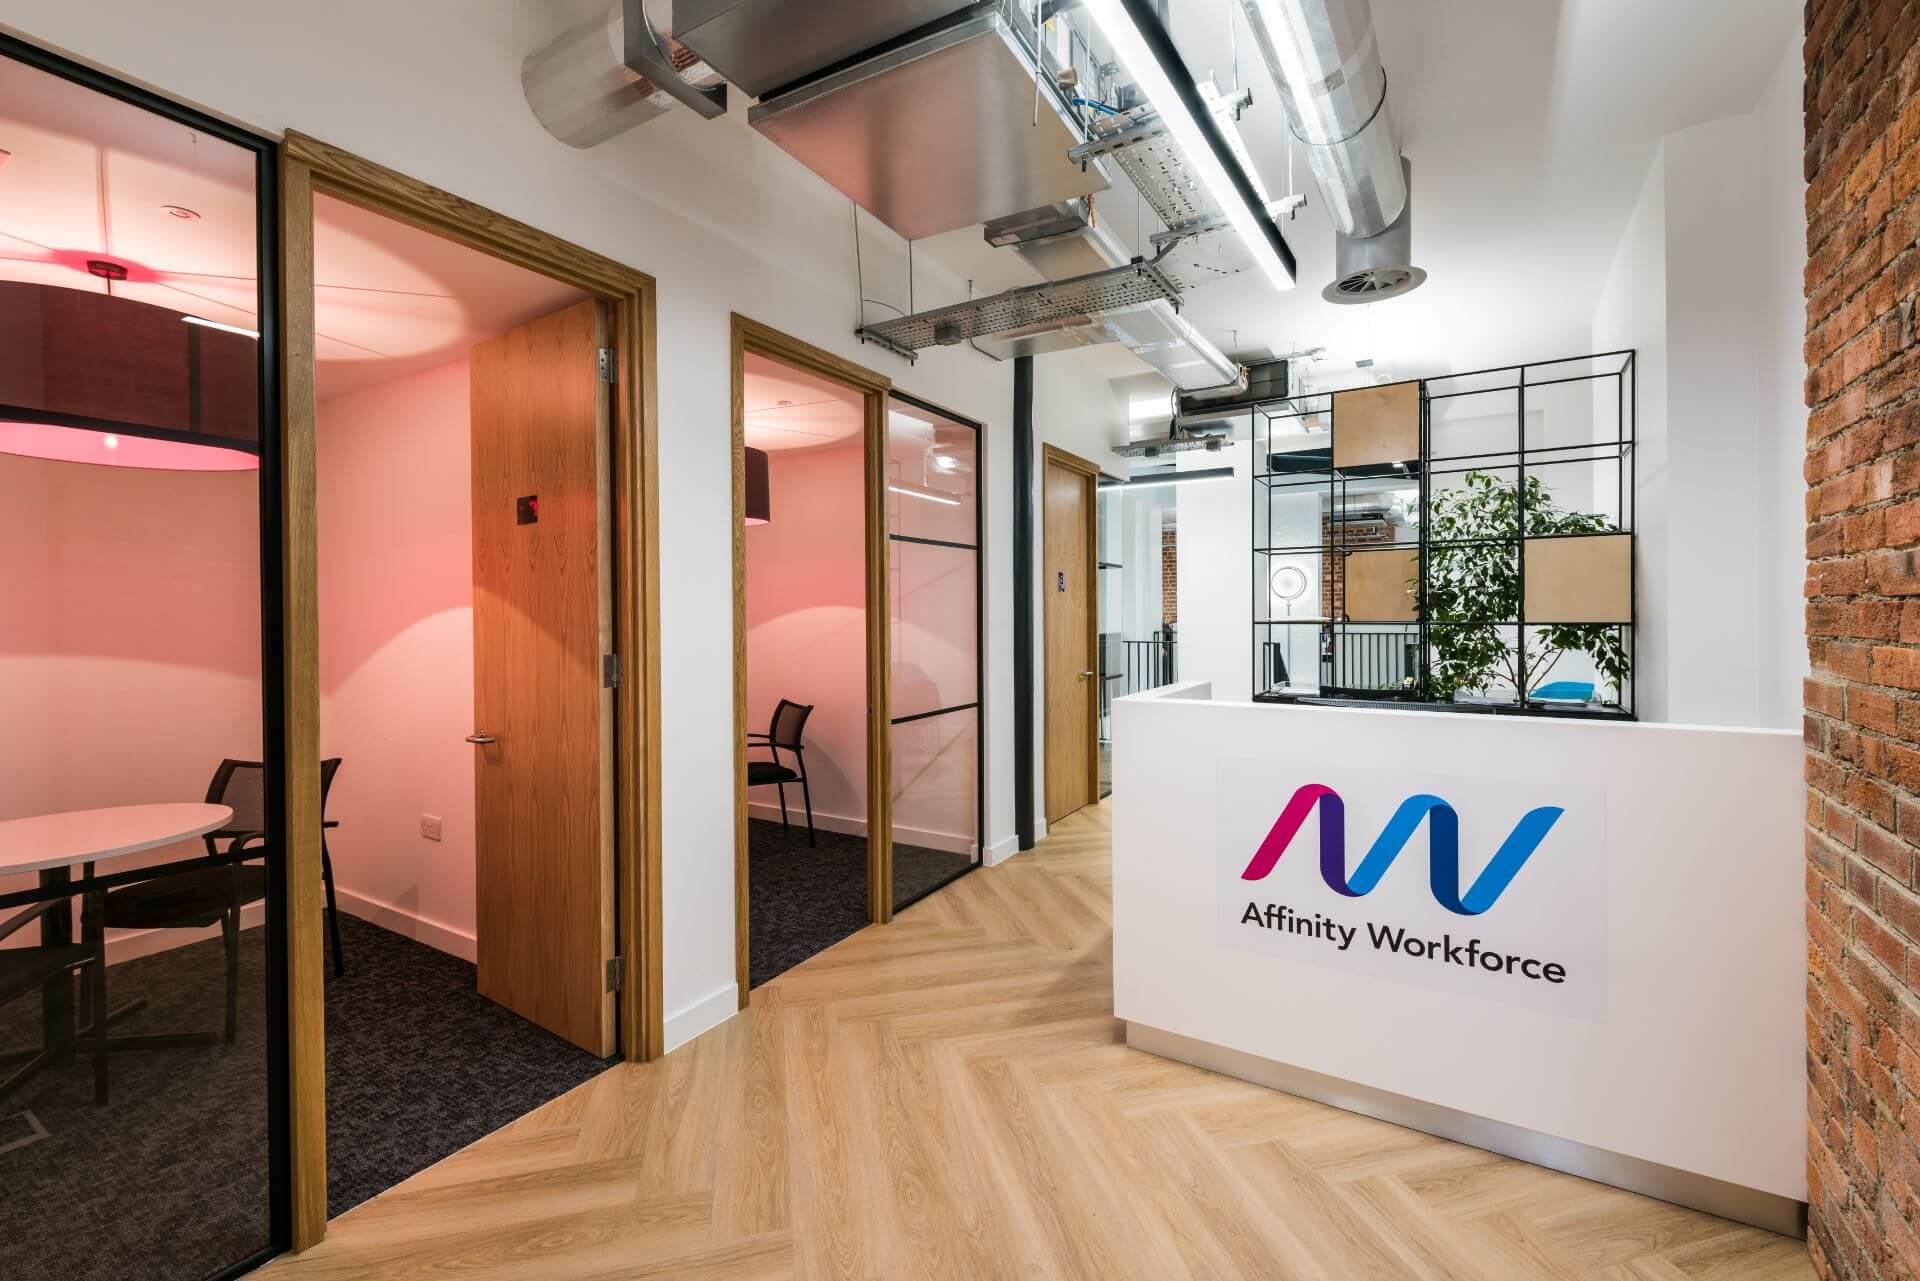 Affinity Workforce Reception